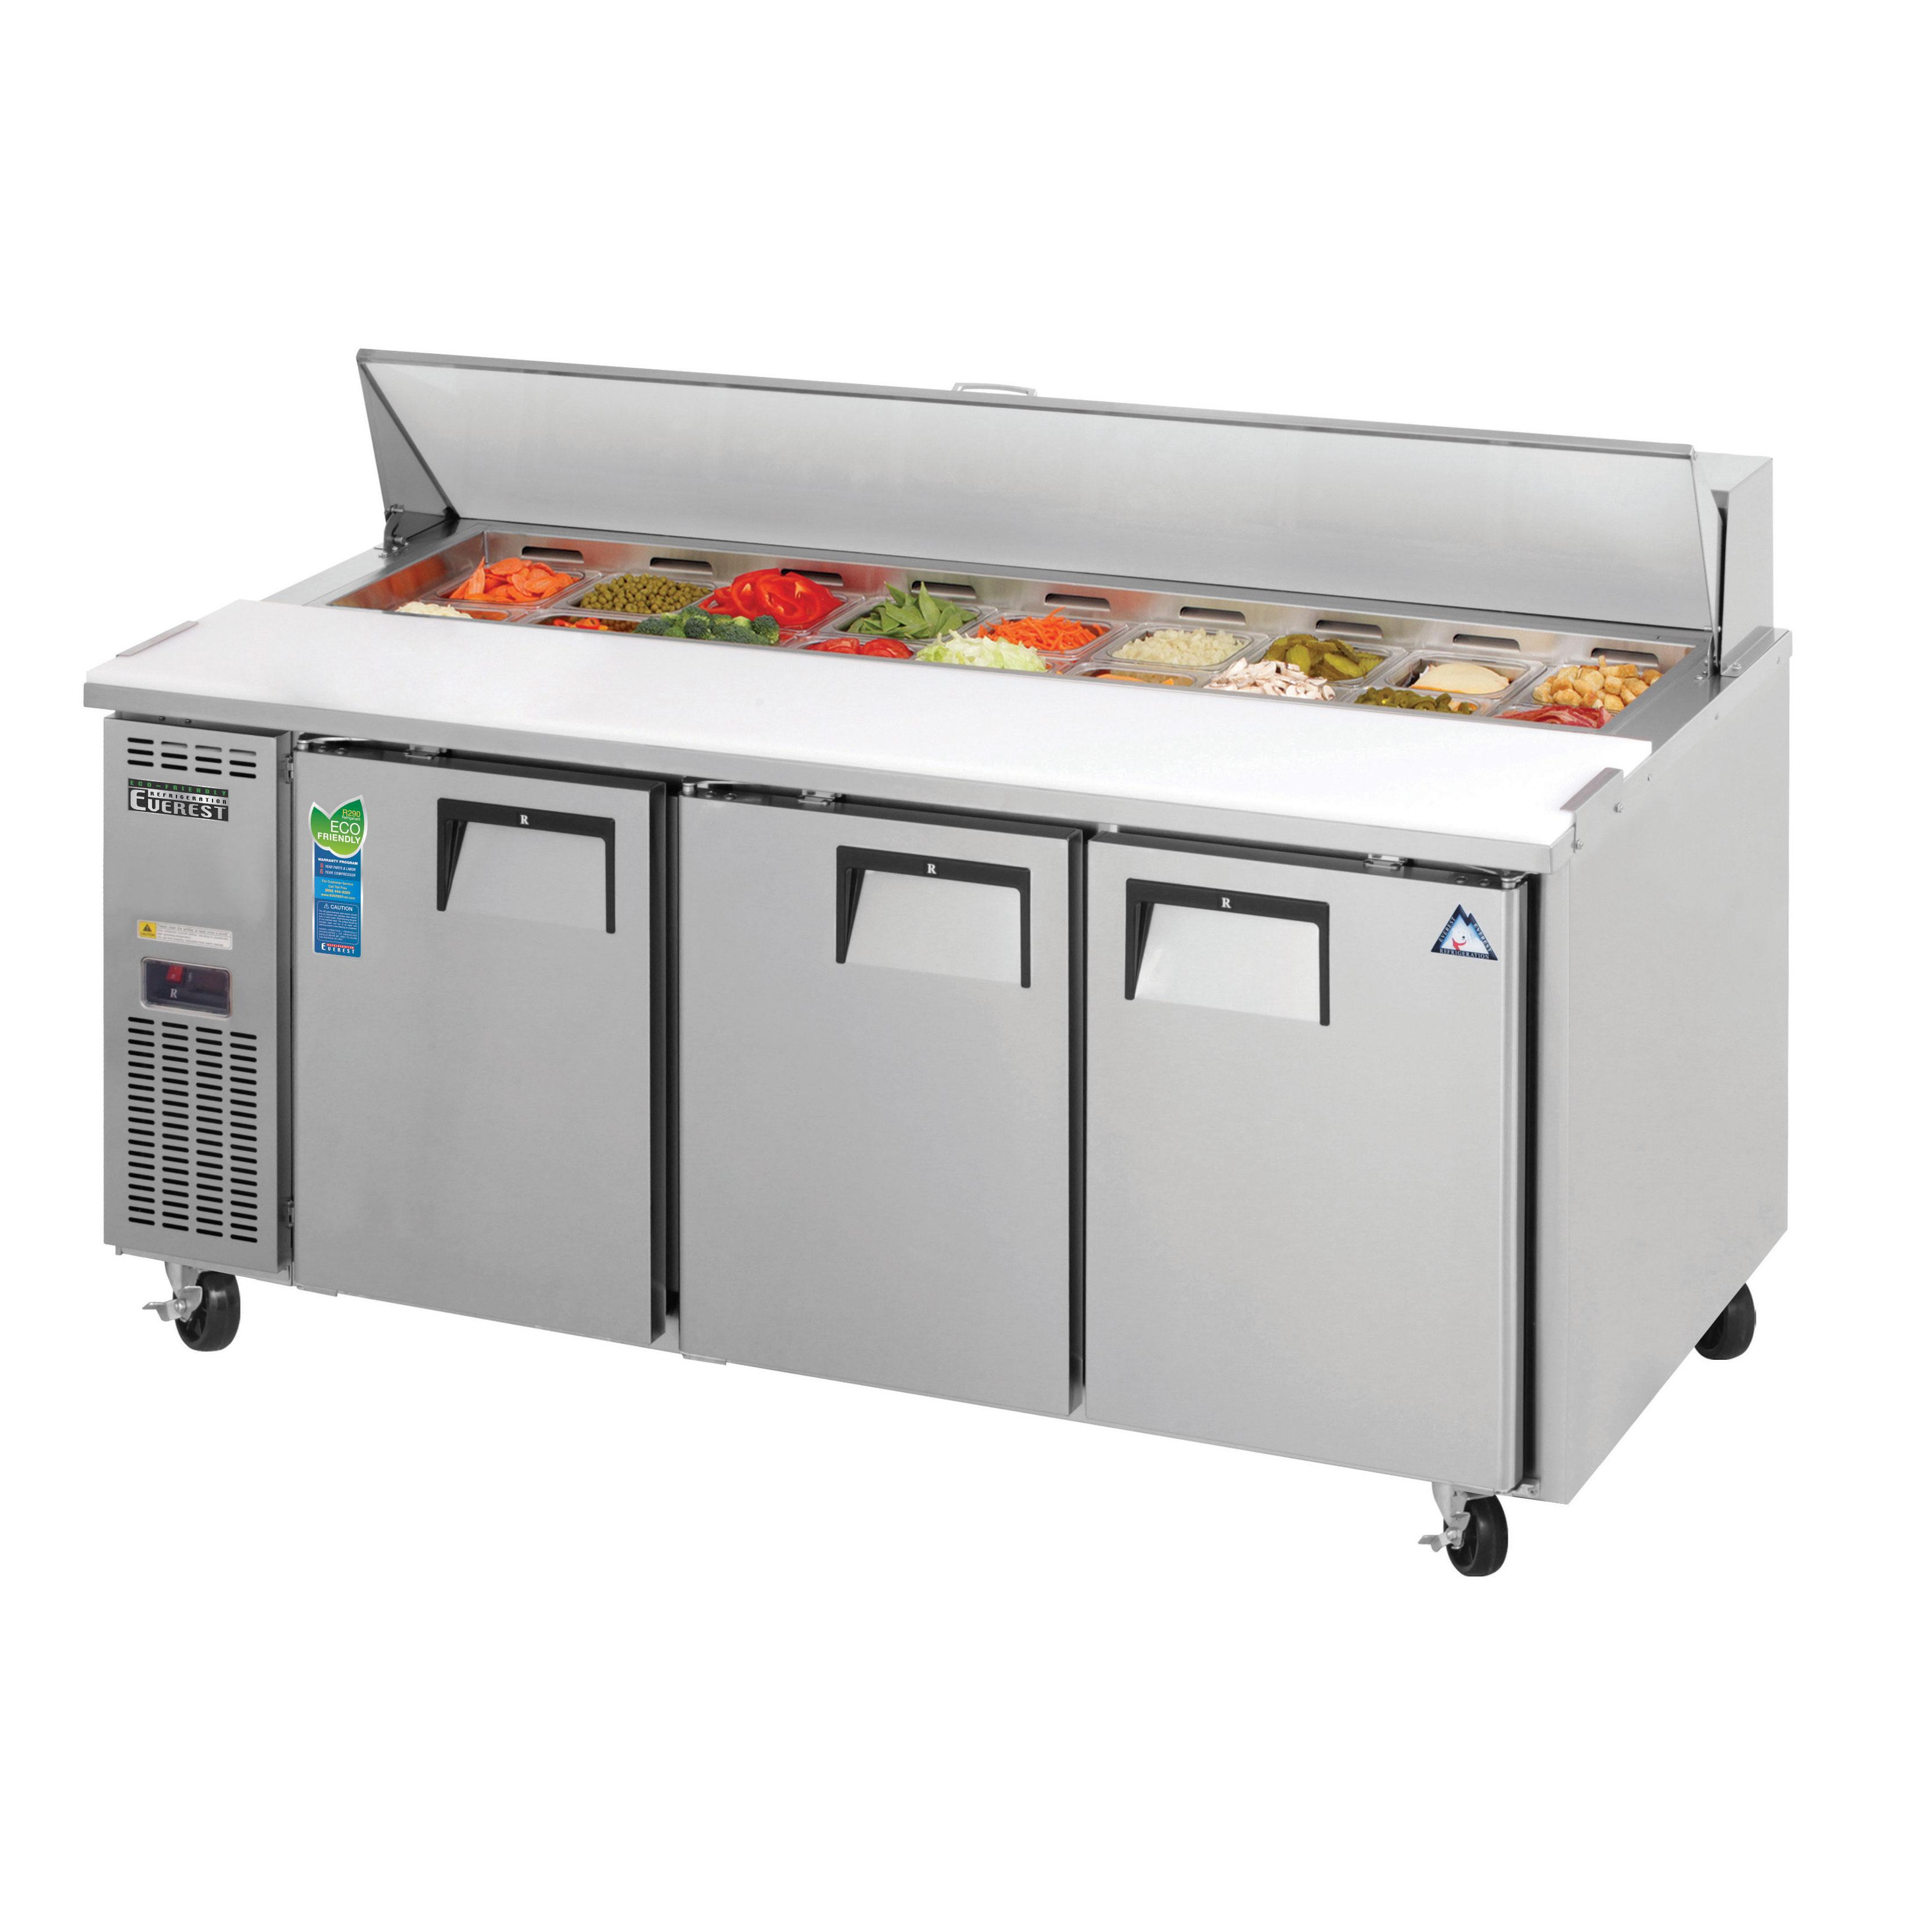 Everest Refrigeration EPR3 refrigerated counter, sandwich / salad unit